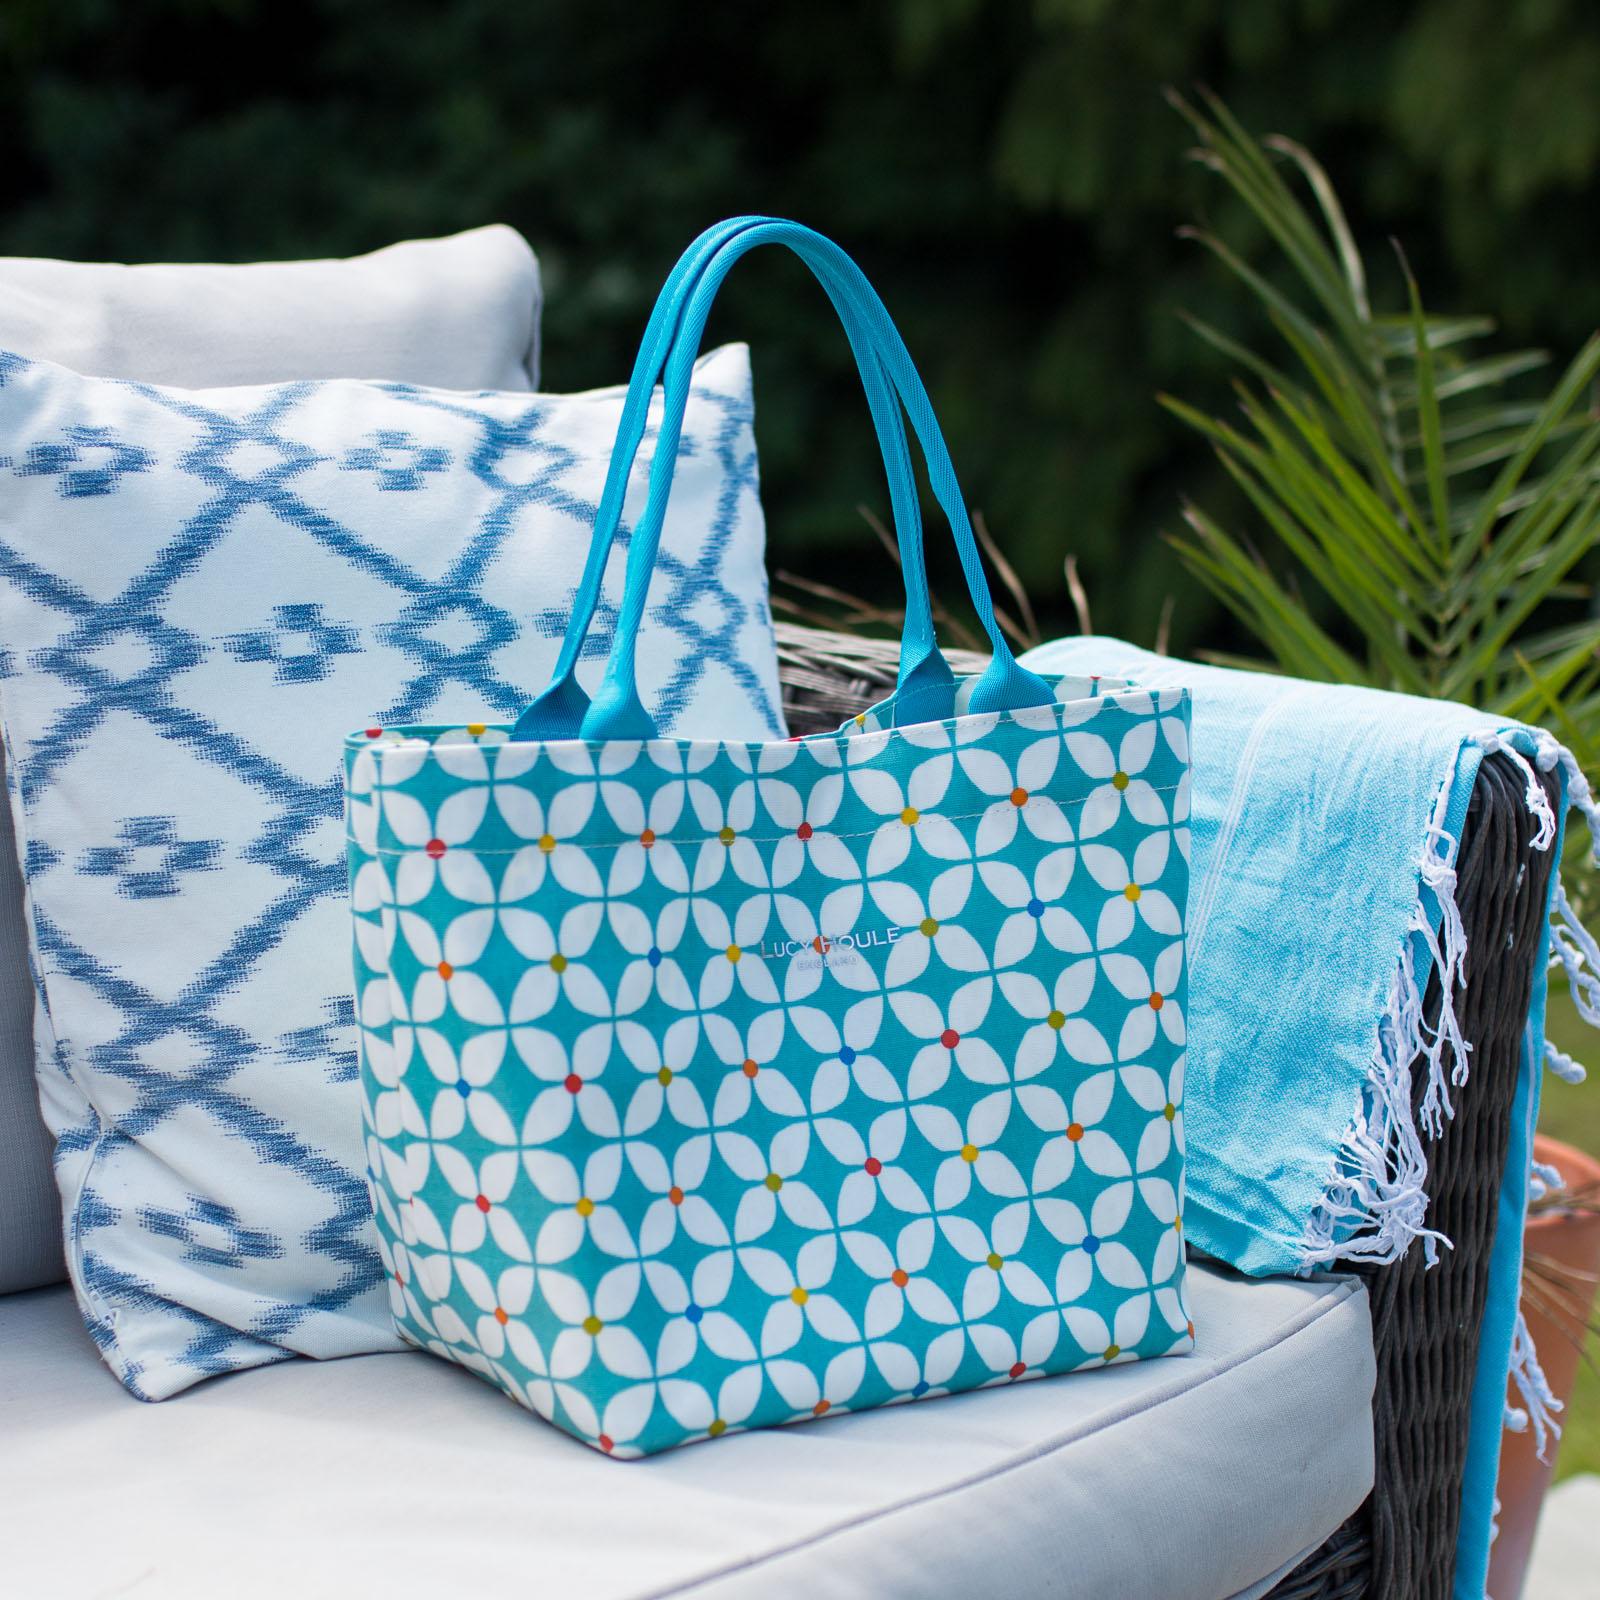 Modern Daisy Aqua Small Grab Bag with Aqua Handles